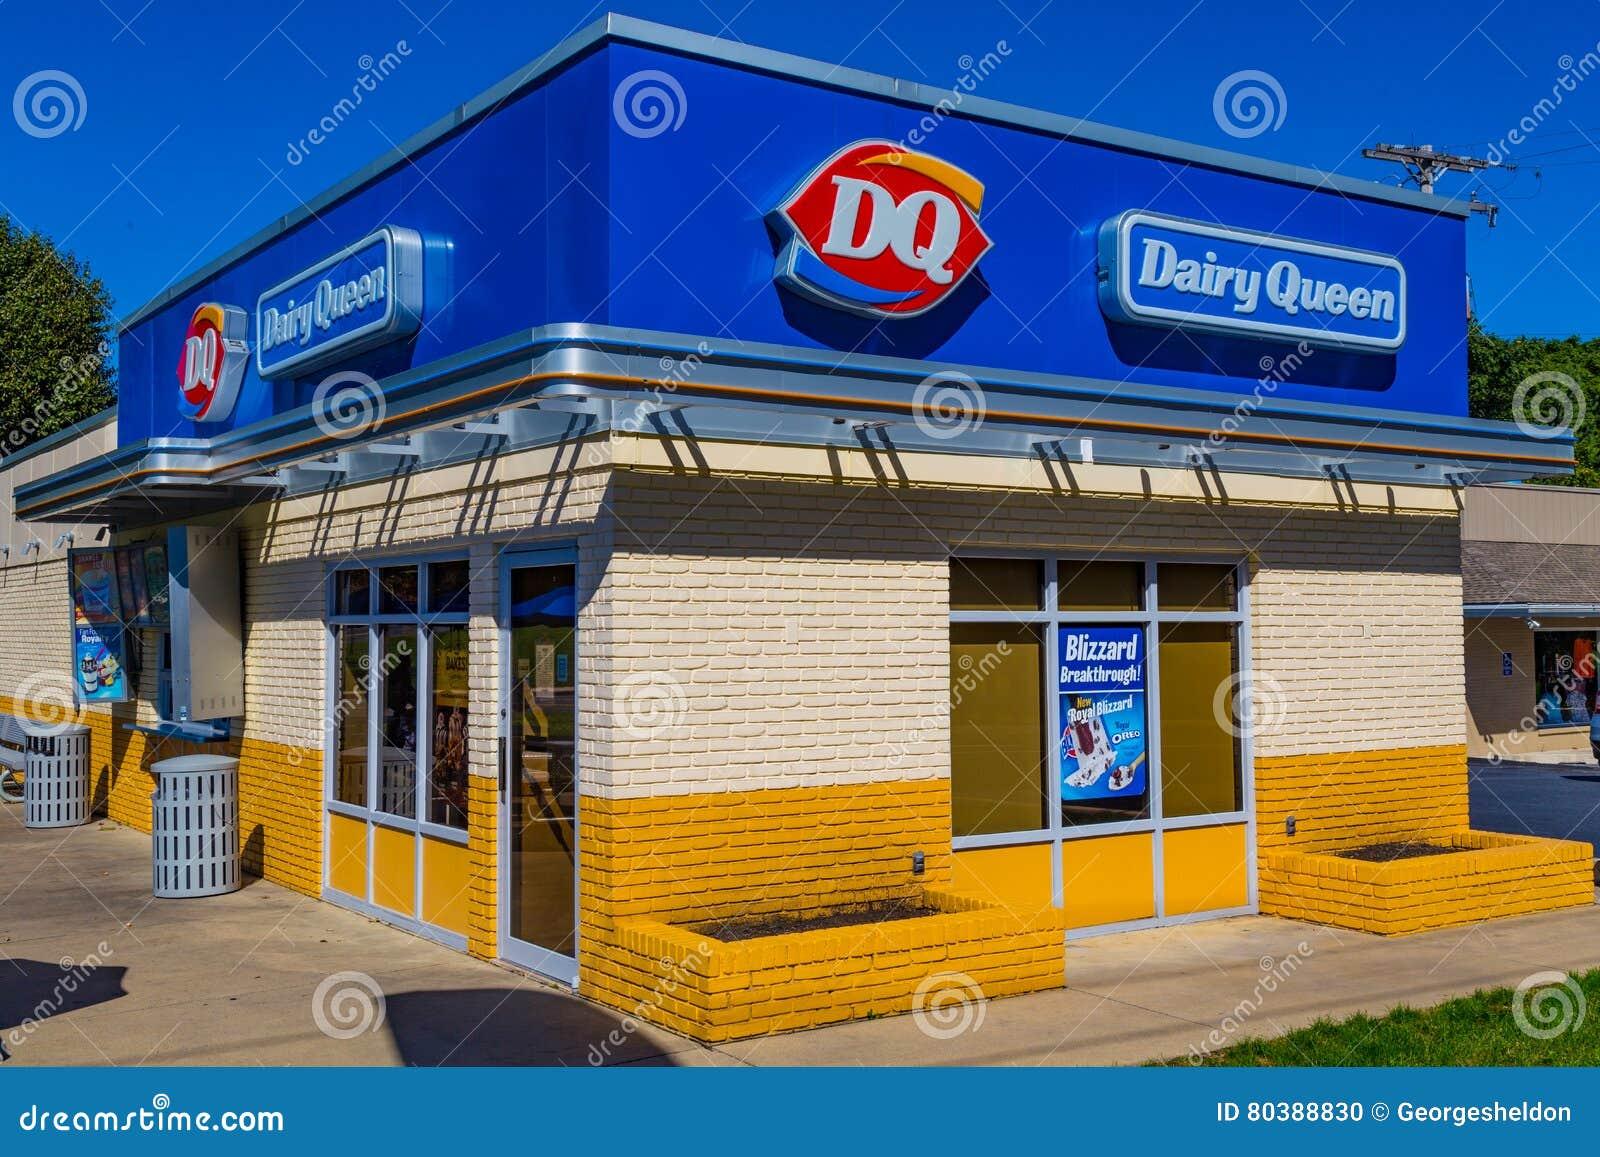 Best Fast Food In Washington